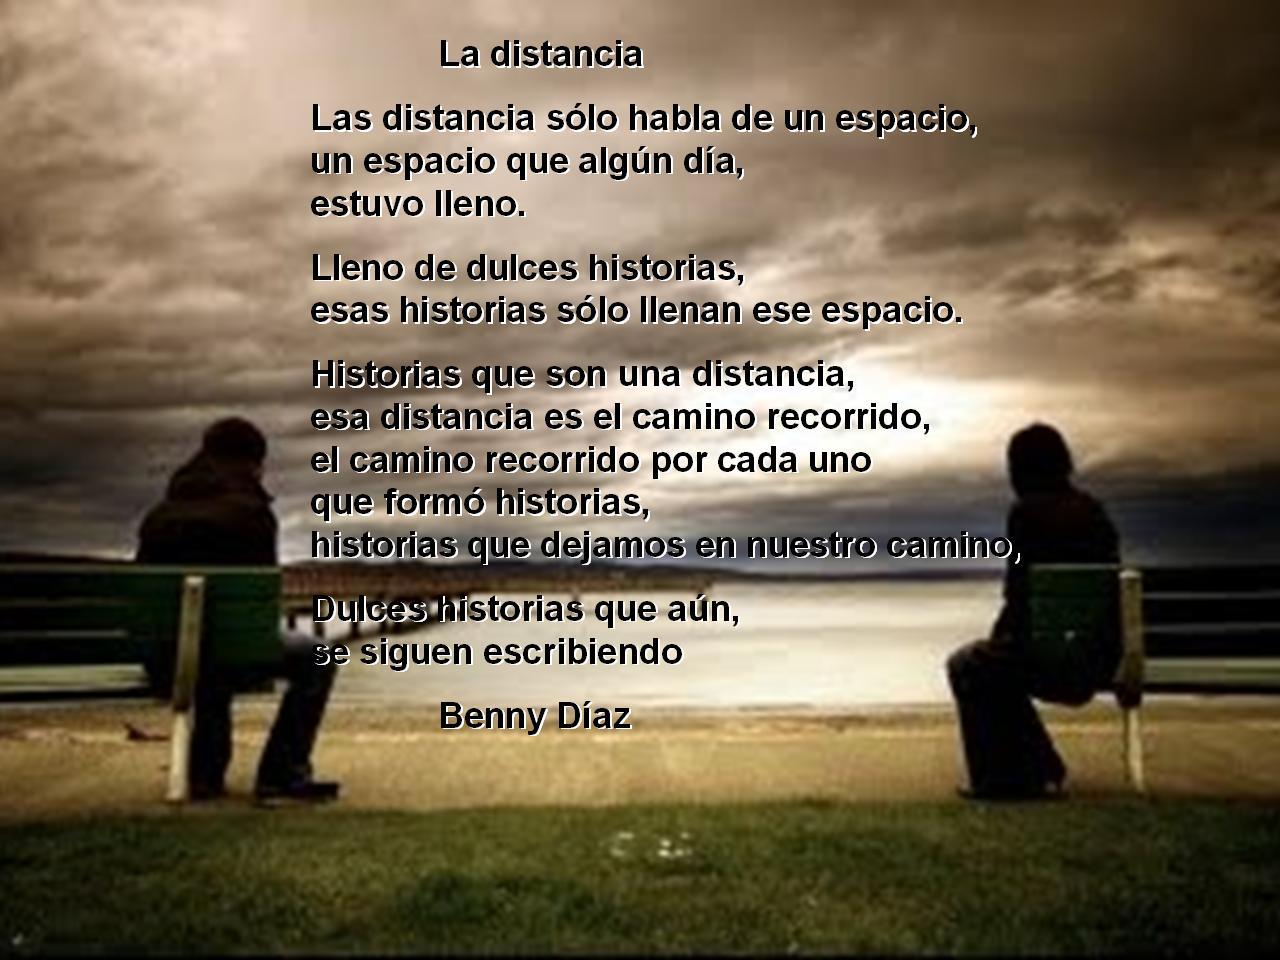 Benny Diaz 001 La distancia